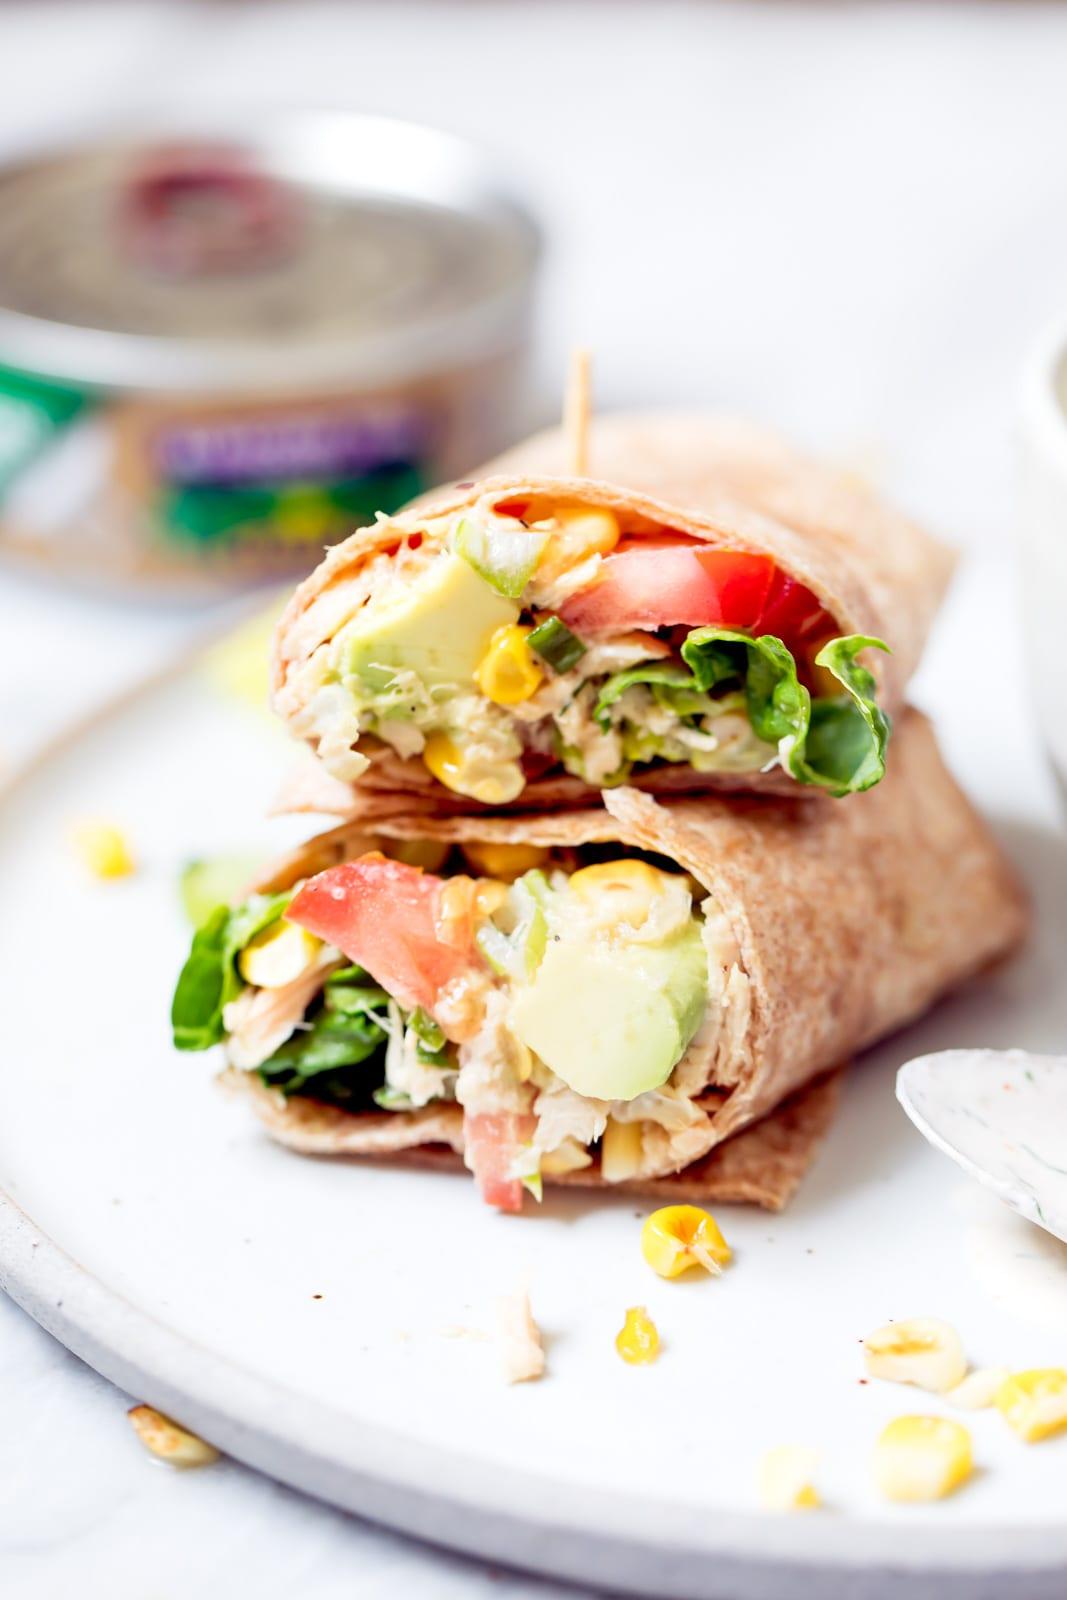 Spicy Tuna Wraps with Homemade Greek Yogurt Ranch